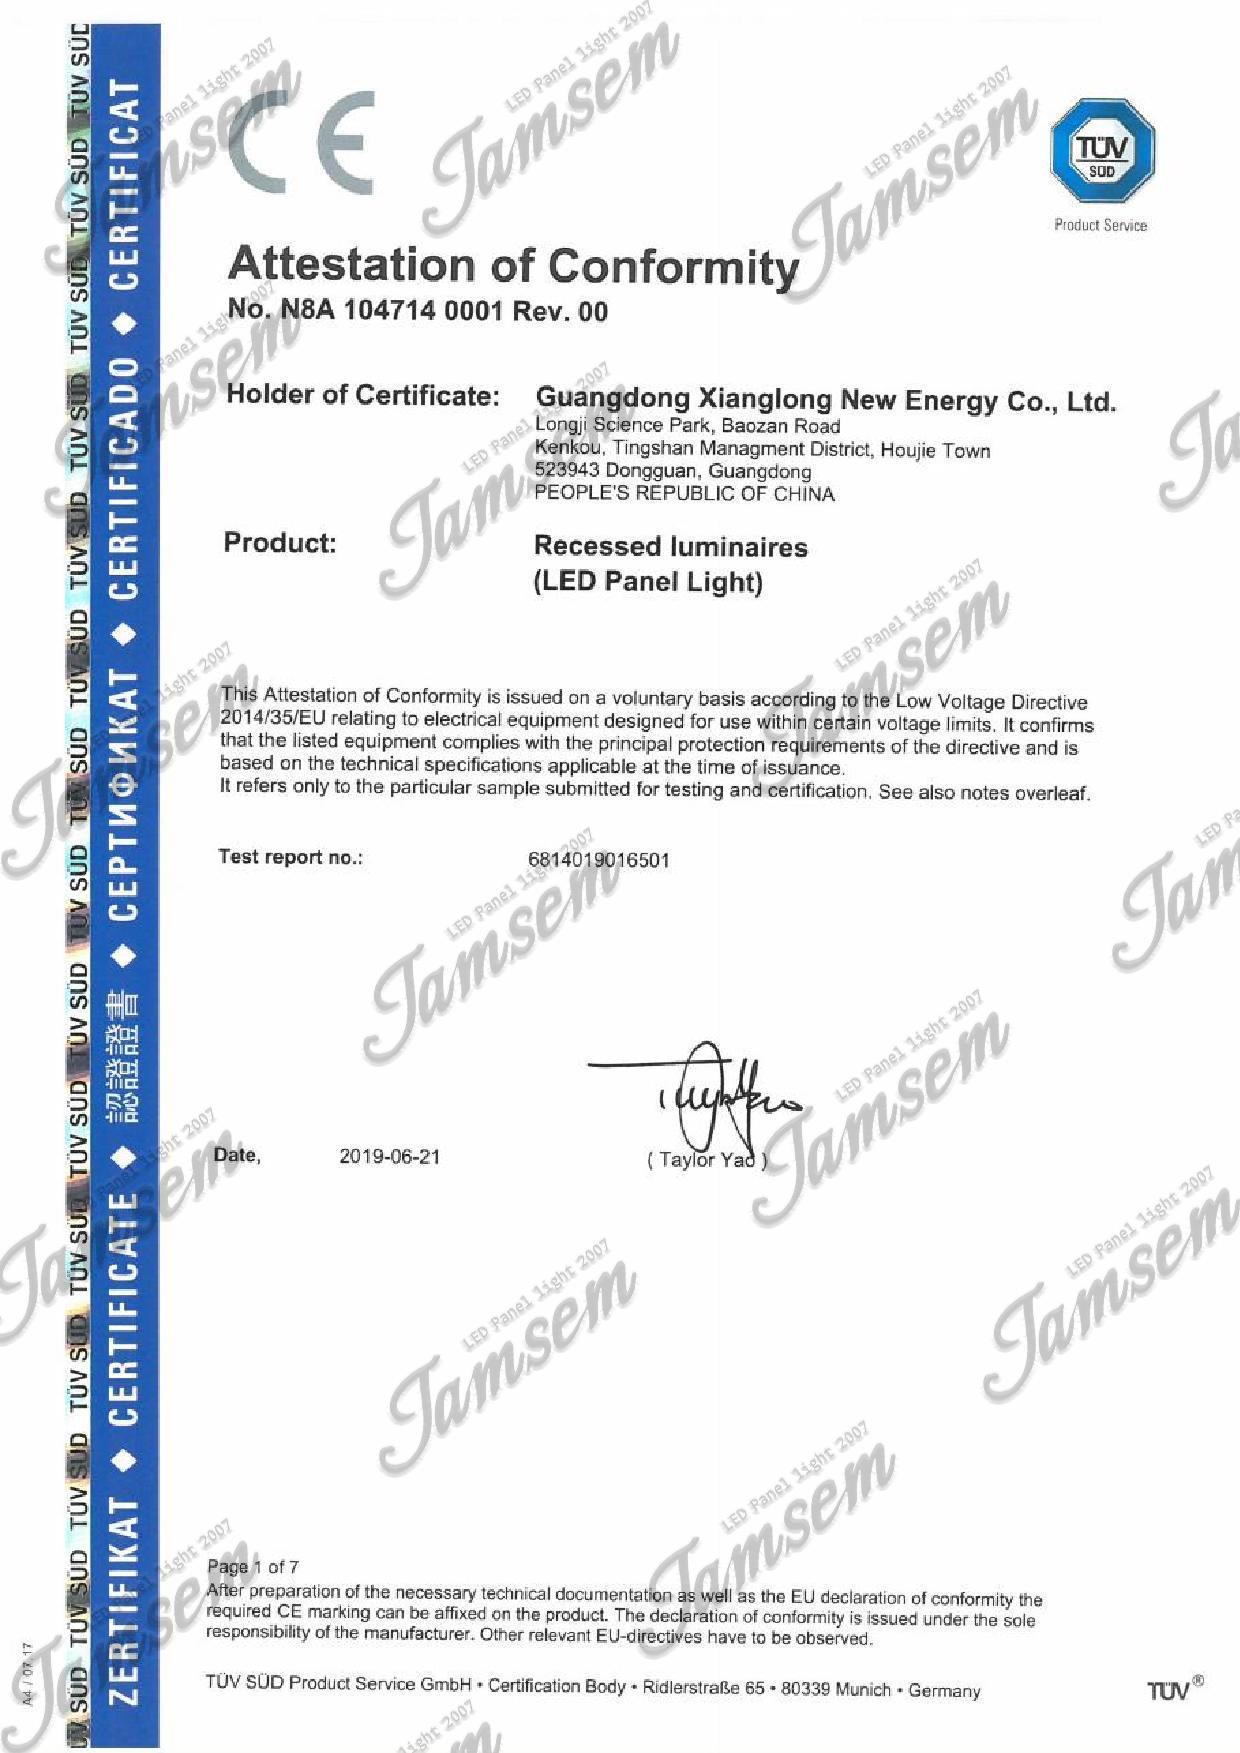 LED panel light CE-LVD certificate - JAMSEM_1